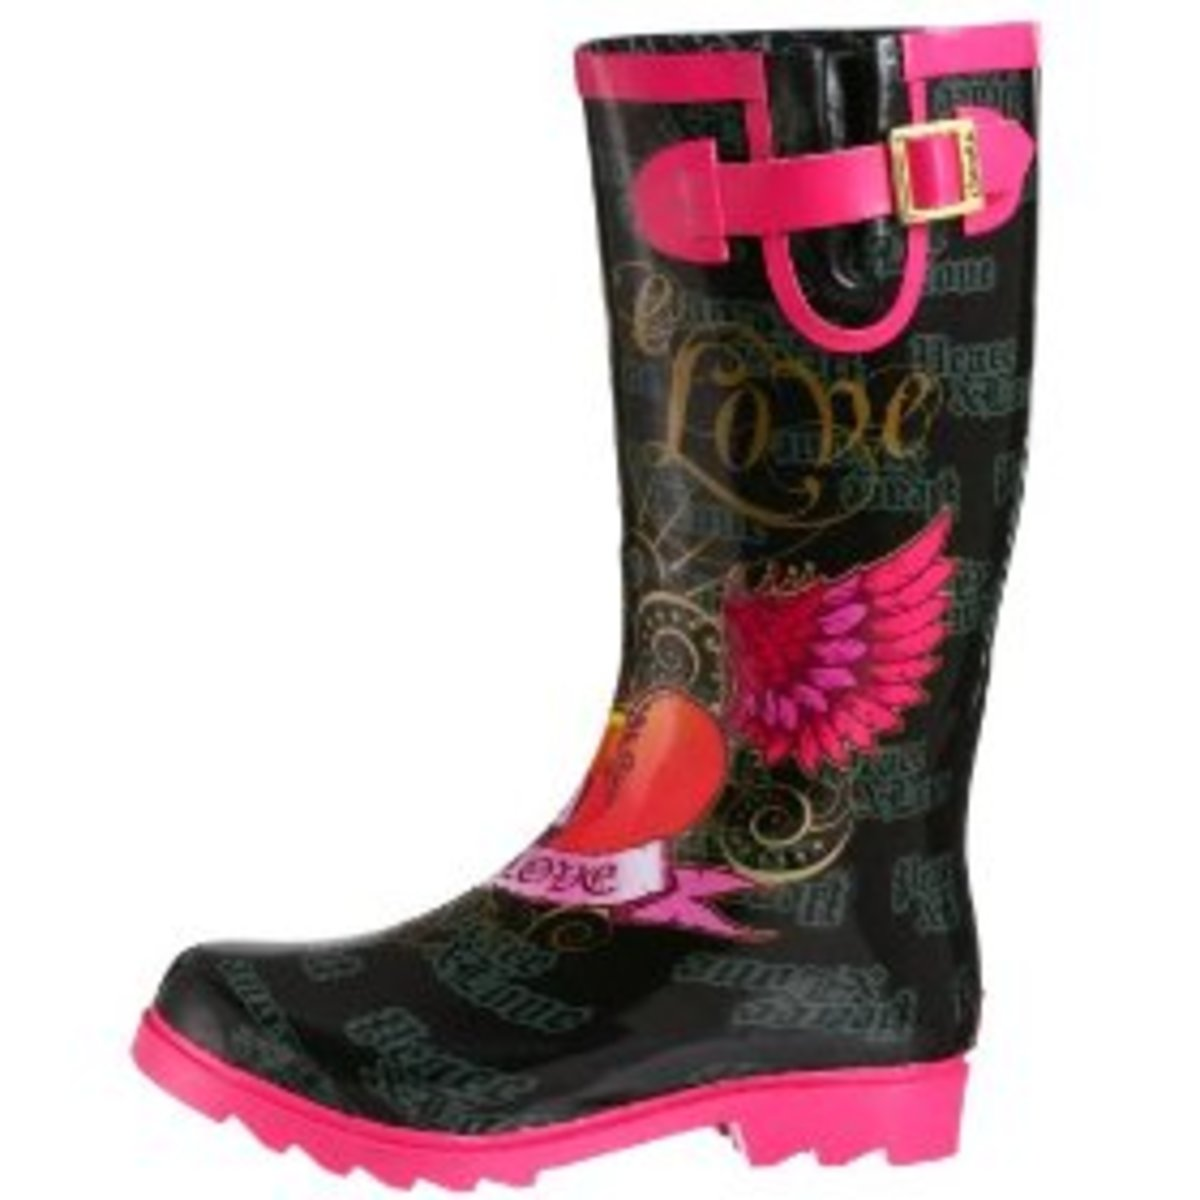 Peace and Love Chooka rain boots